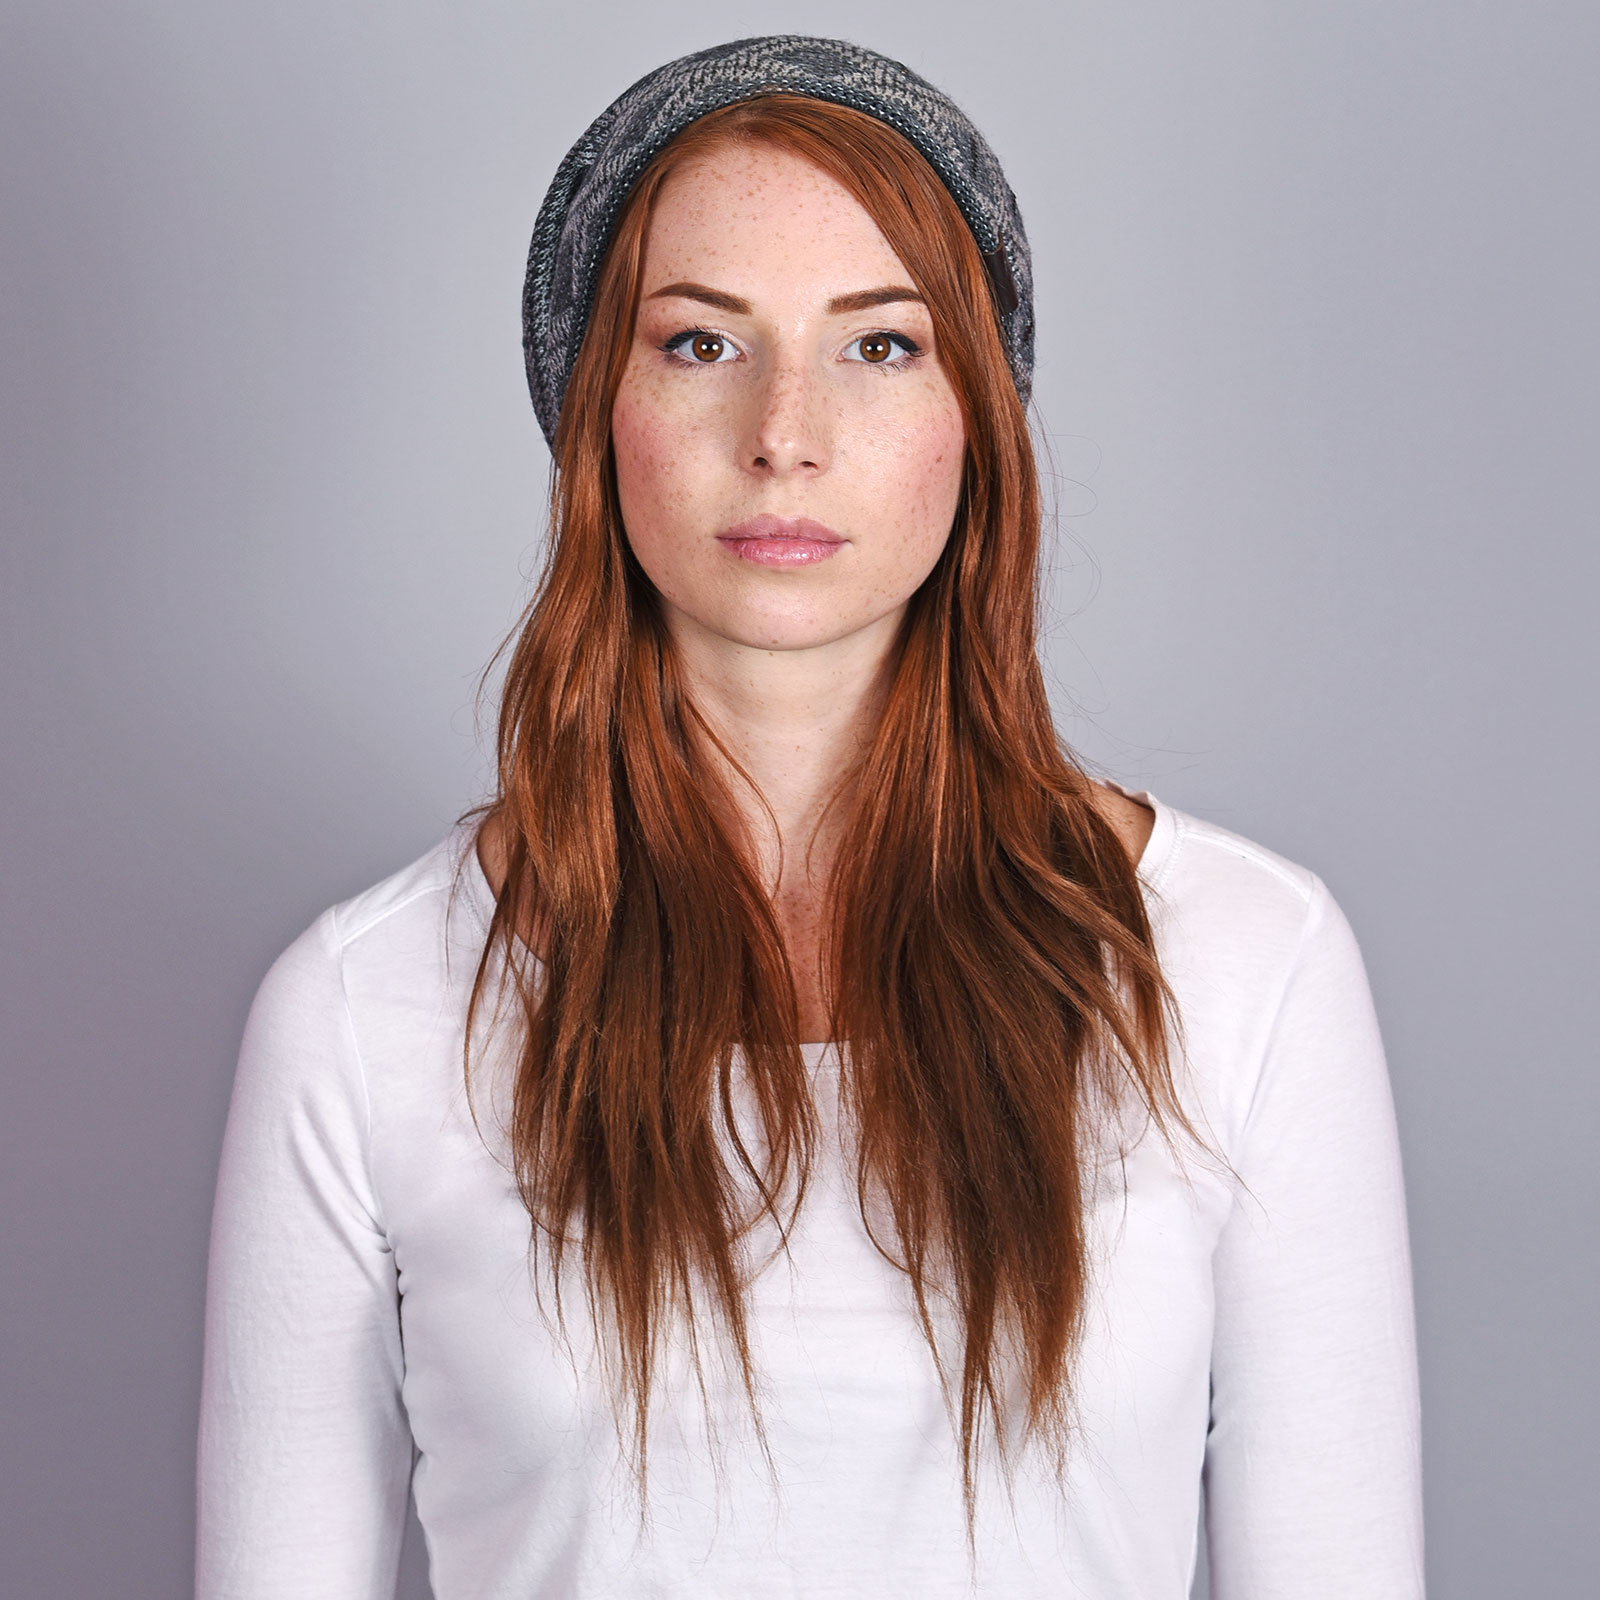 CP-01045-VF16-2-bonnet-femme-tendaznce-gris-anthracite